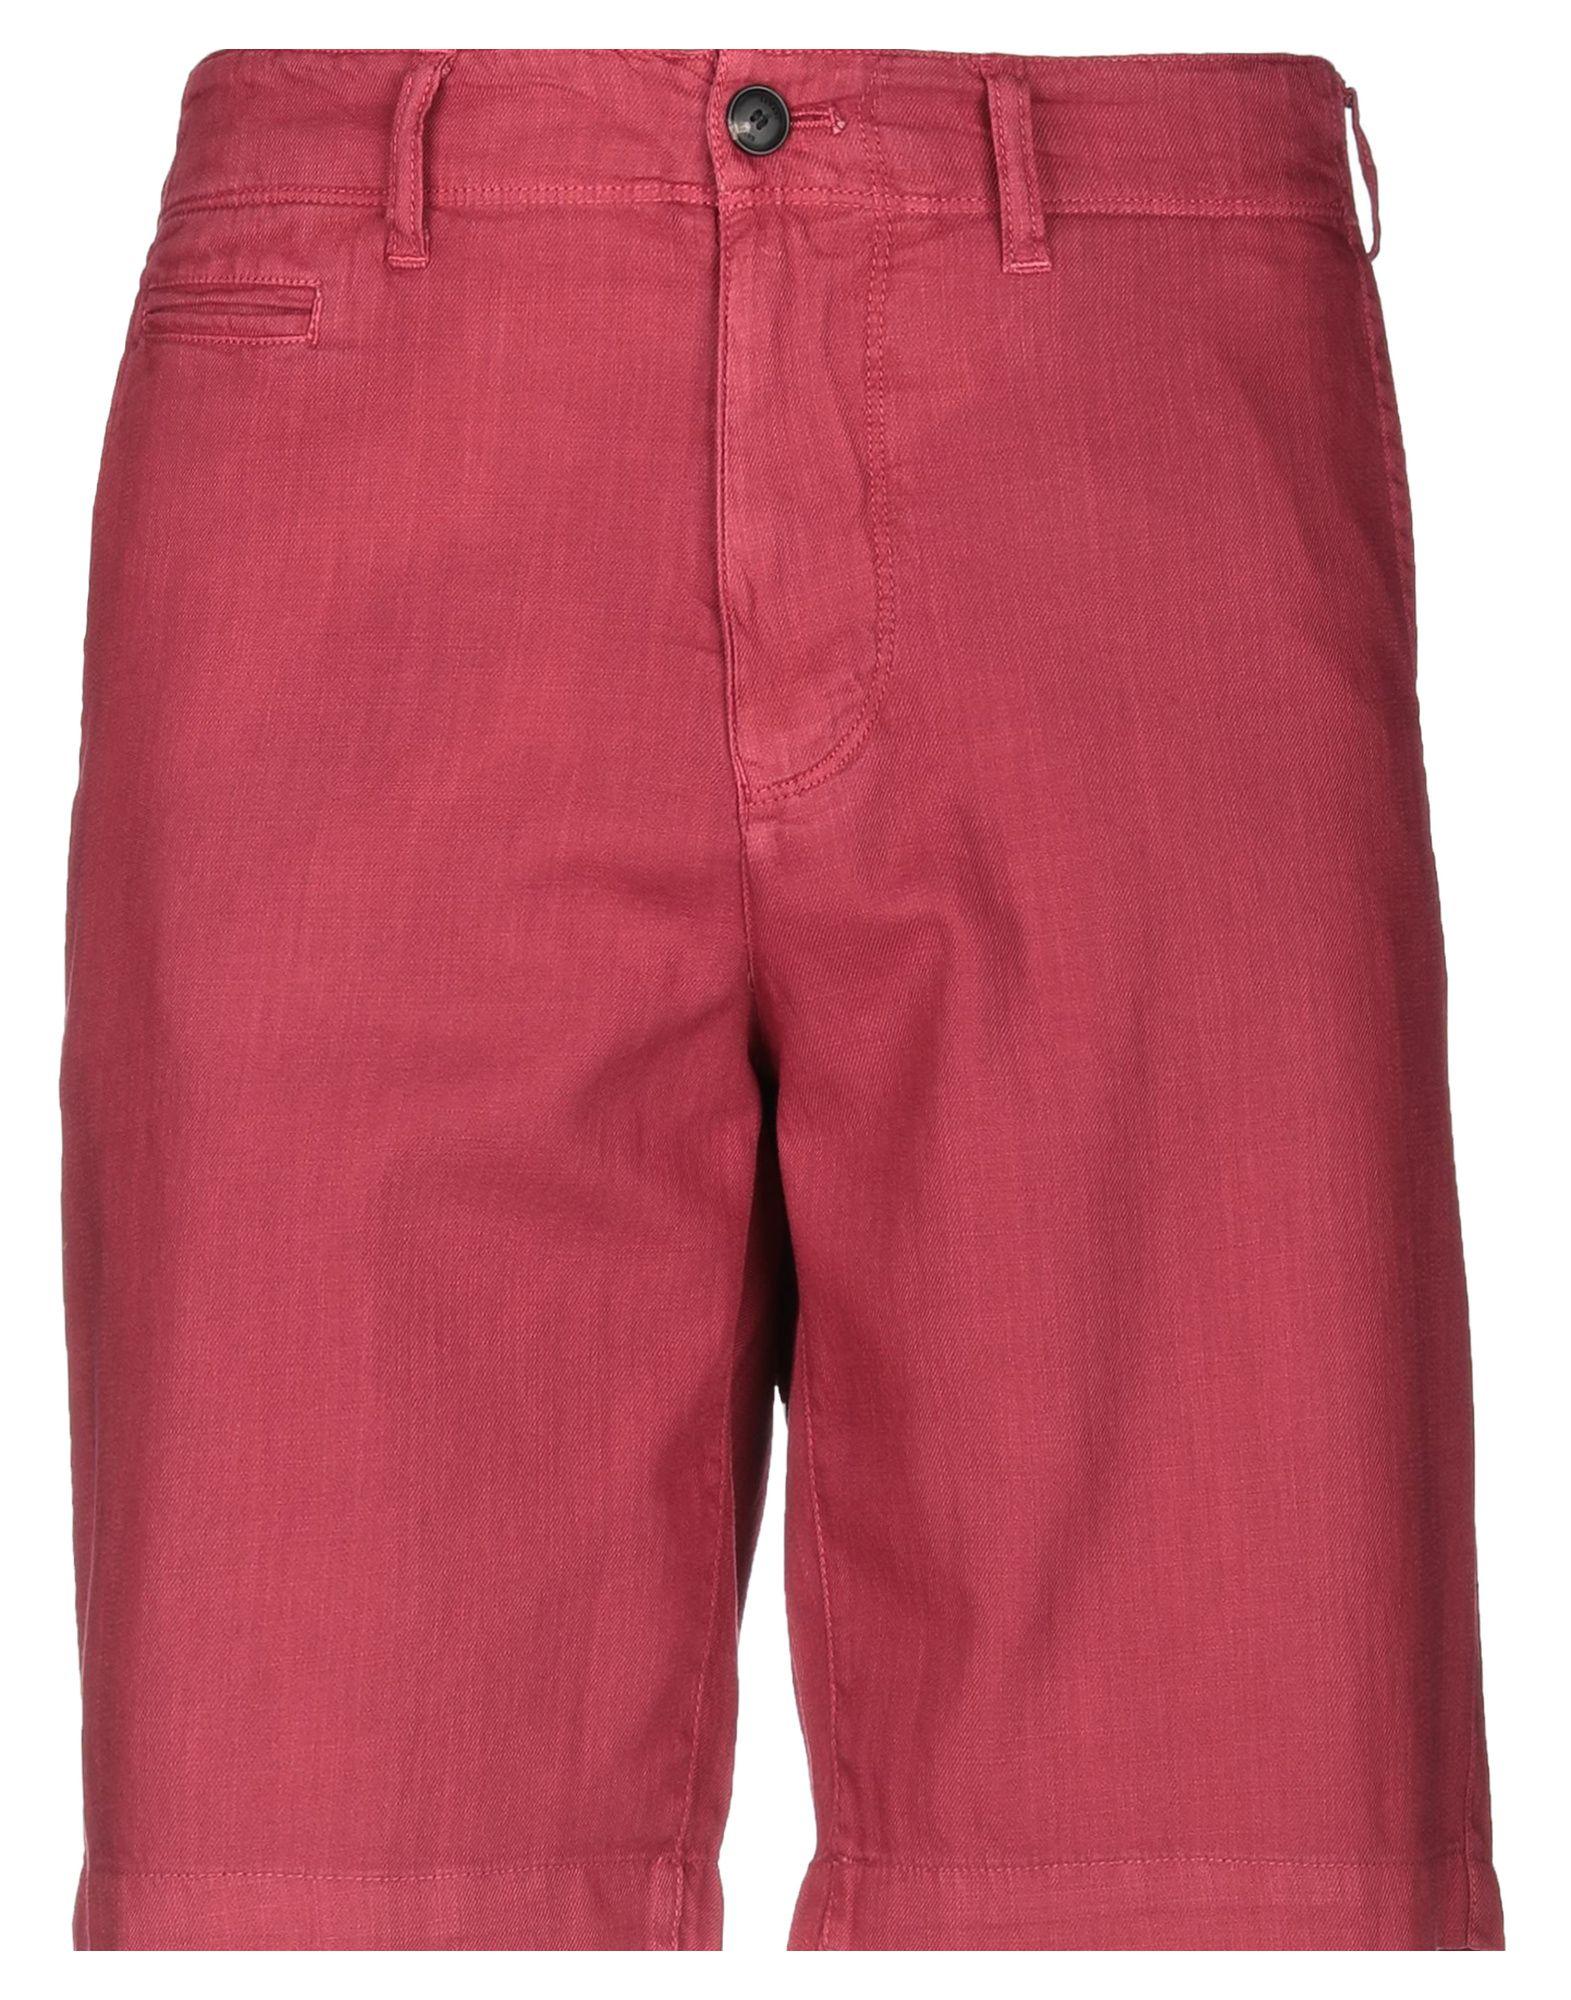 ARMANI JEANS Бермуды armani aj men s designer regular fit denim jeans a6j917b